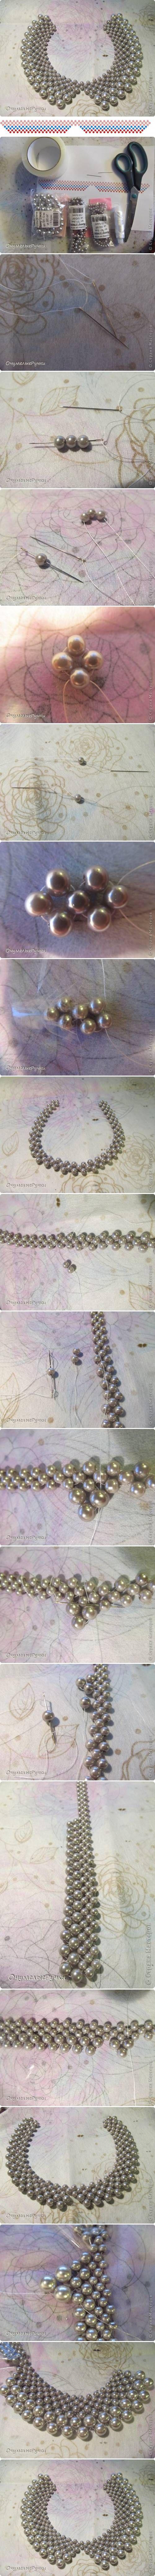 DIY Collar of Beads Necklace